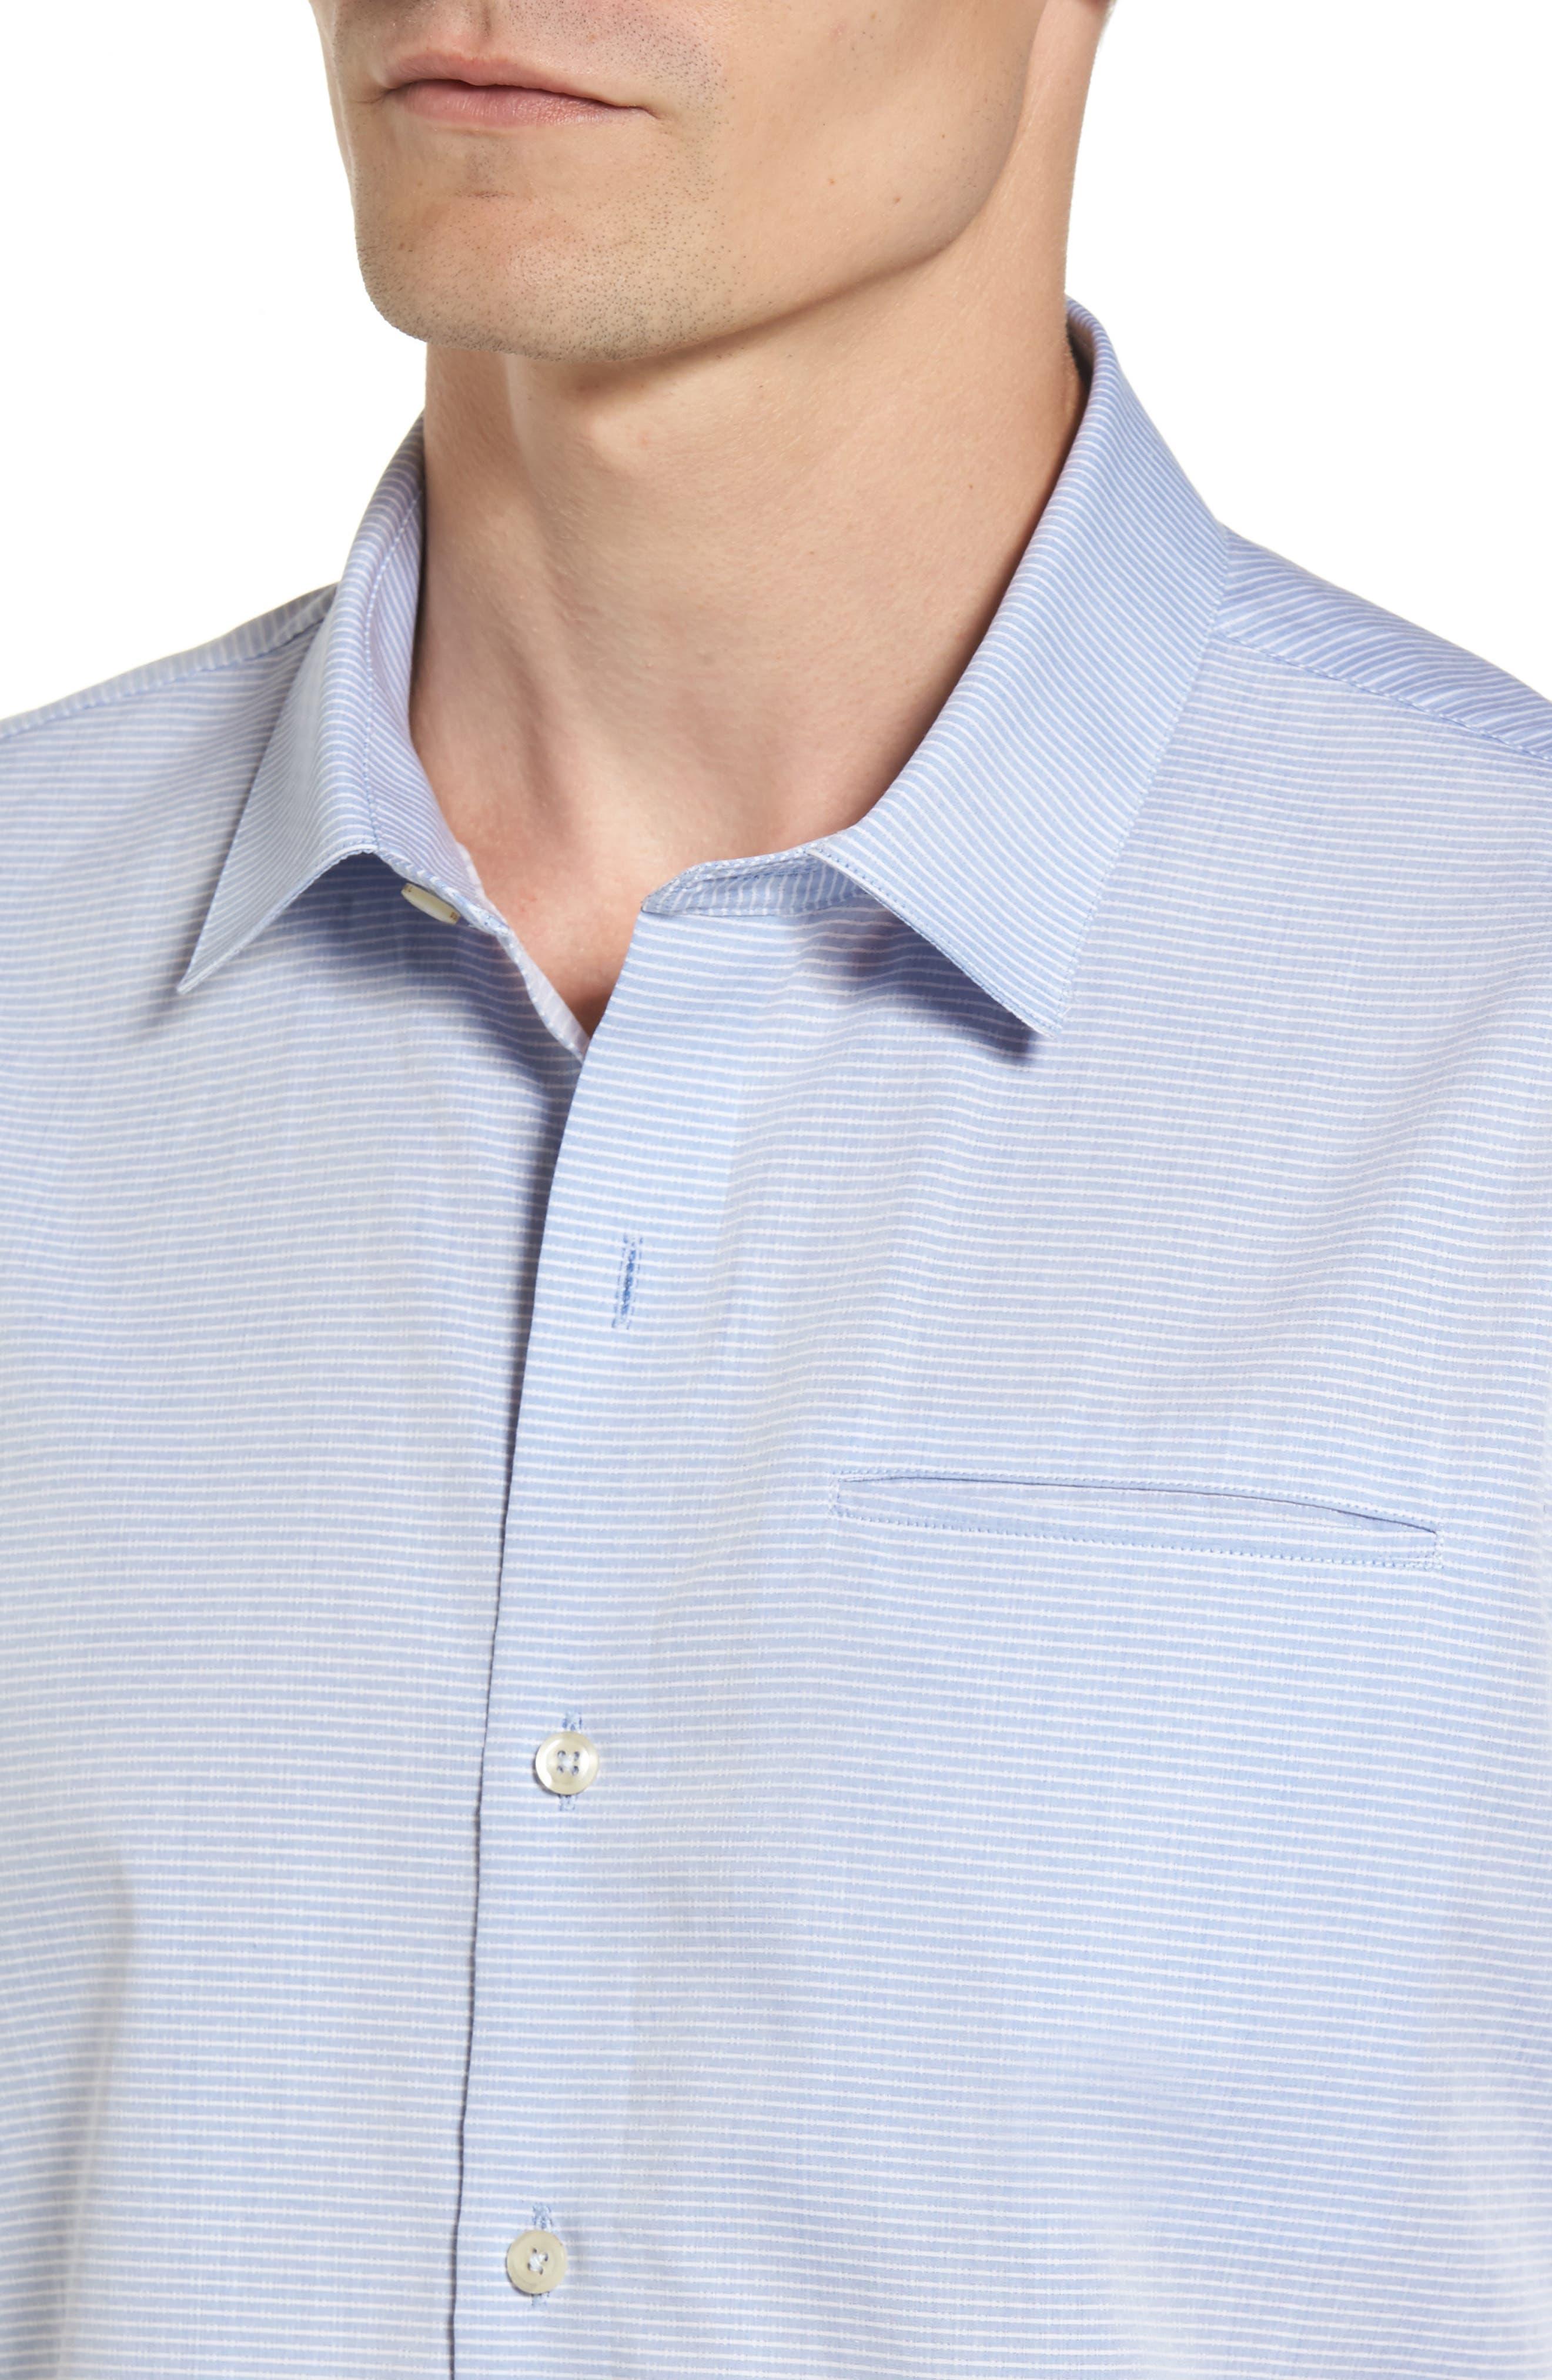 Stripe Woven Shirt,                             Alternate thumbnail 4, color,                             Light Blue